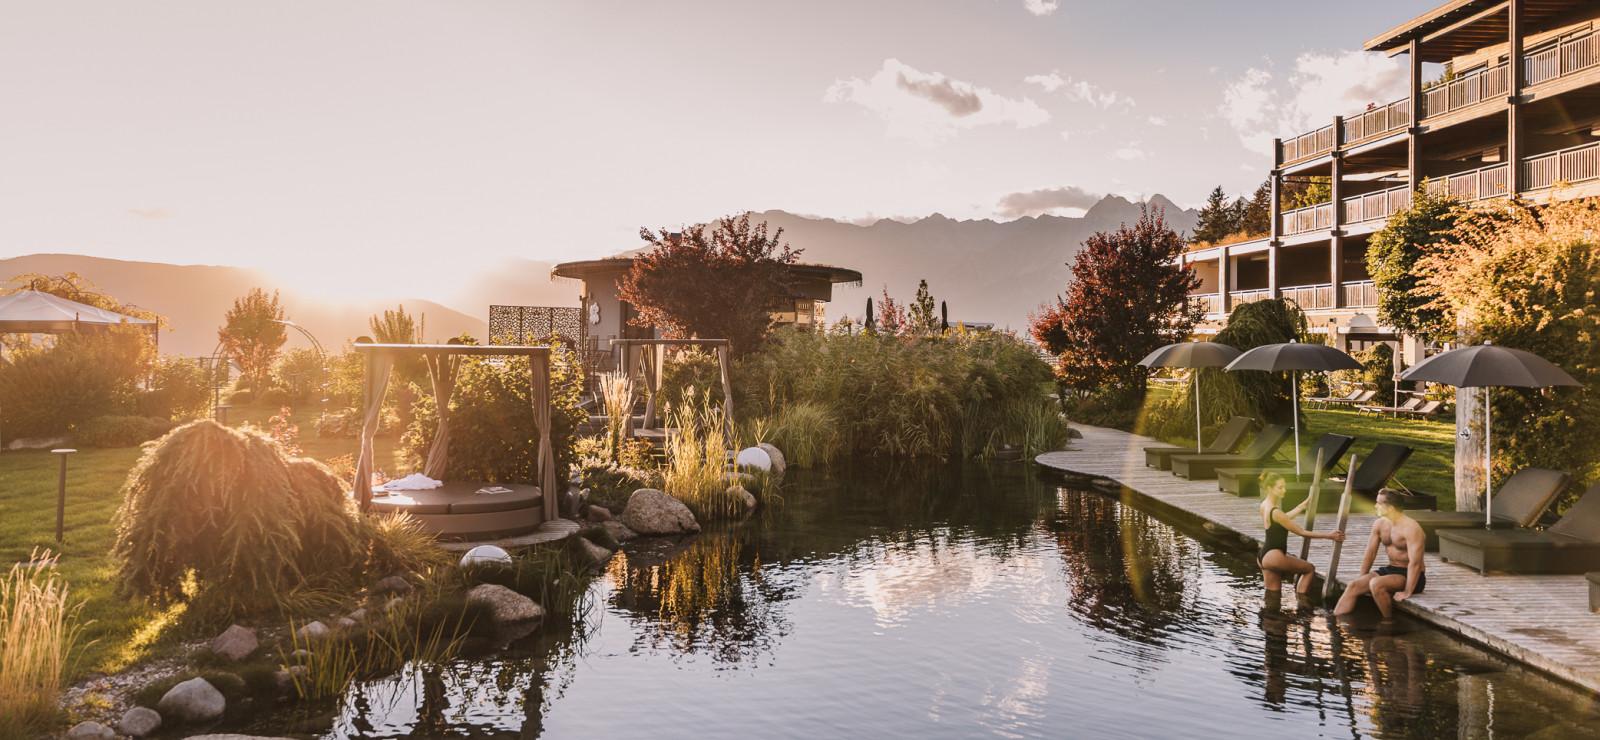 Wellnesshotels hafling s dtirol bewertungen f r for Design wellnesshotel sudtirol